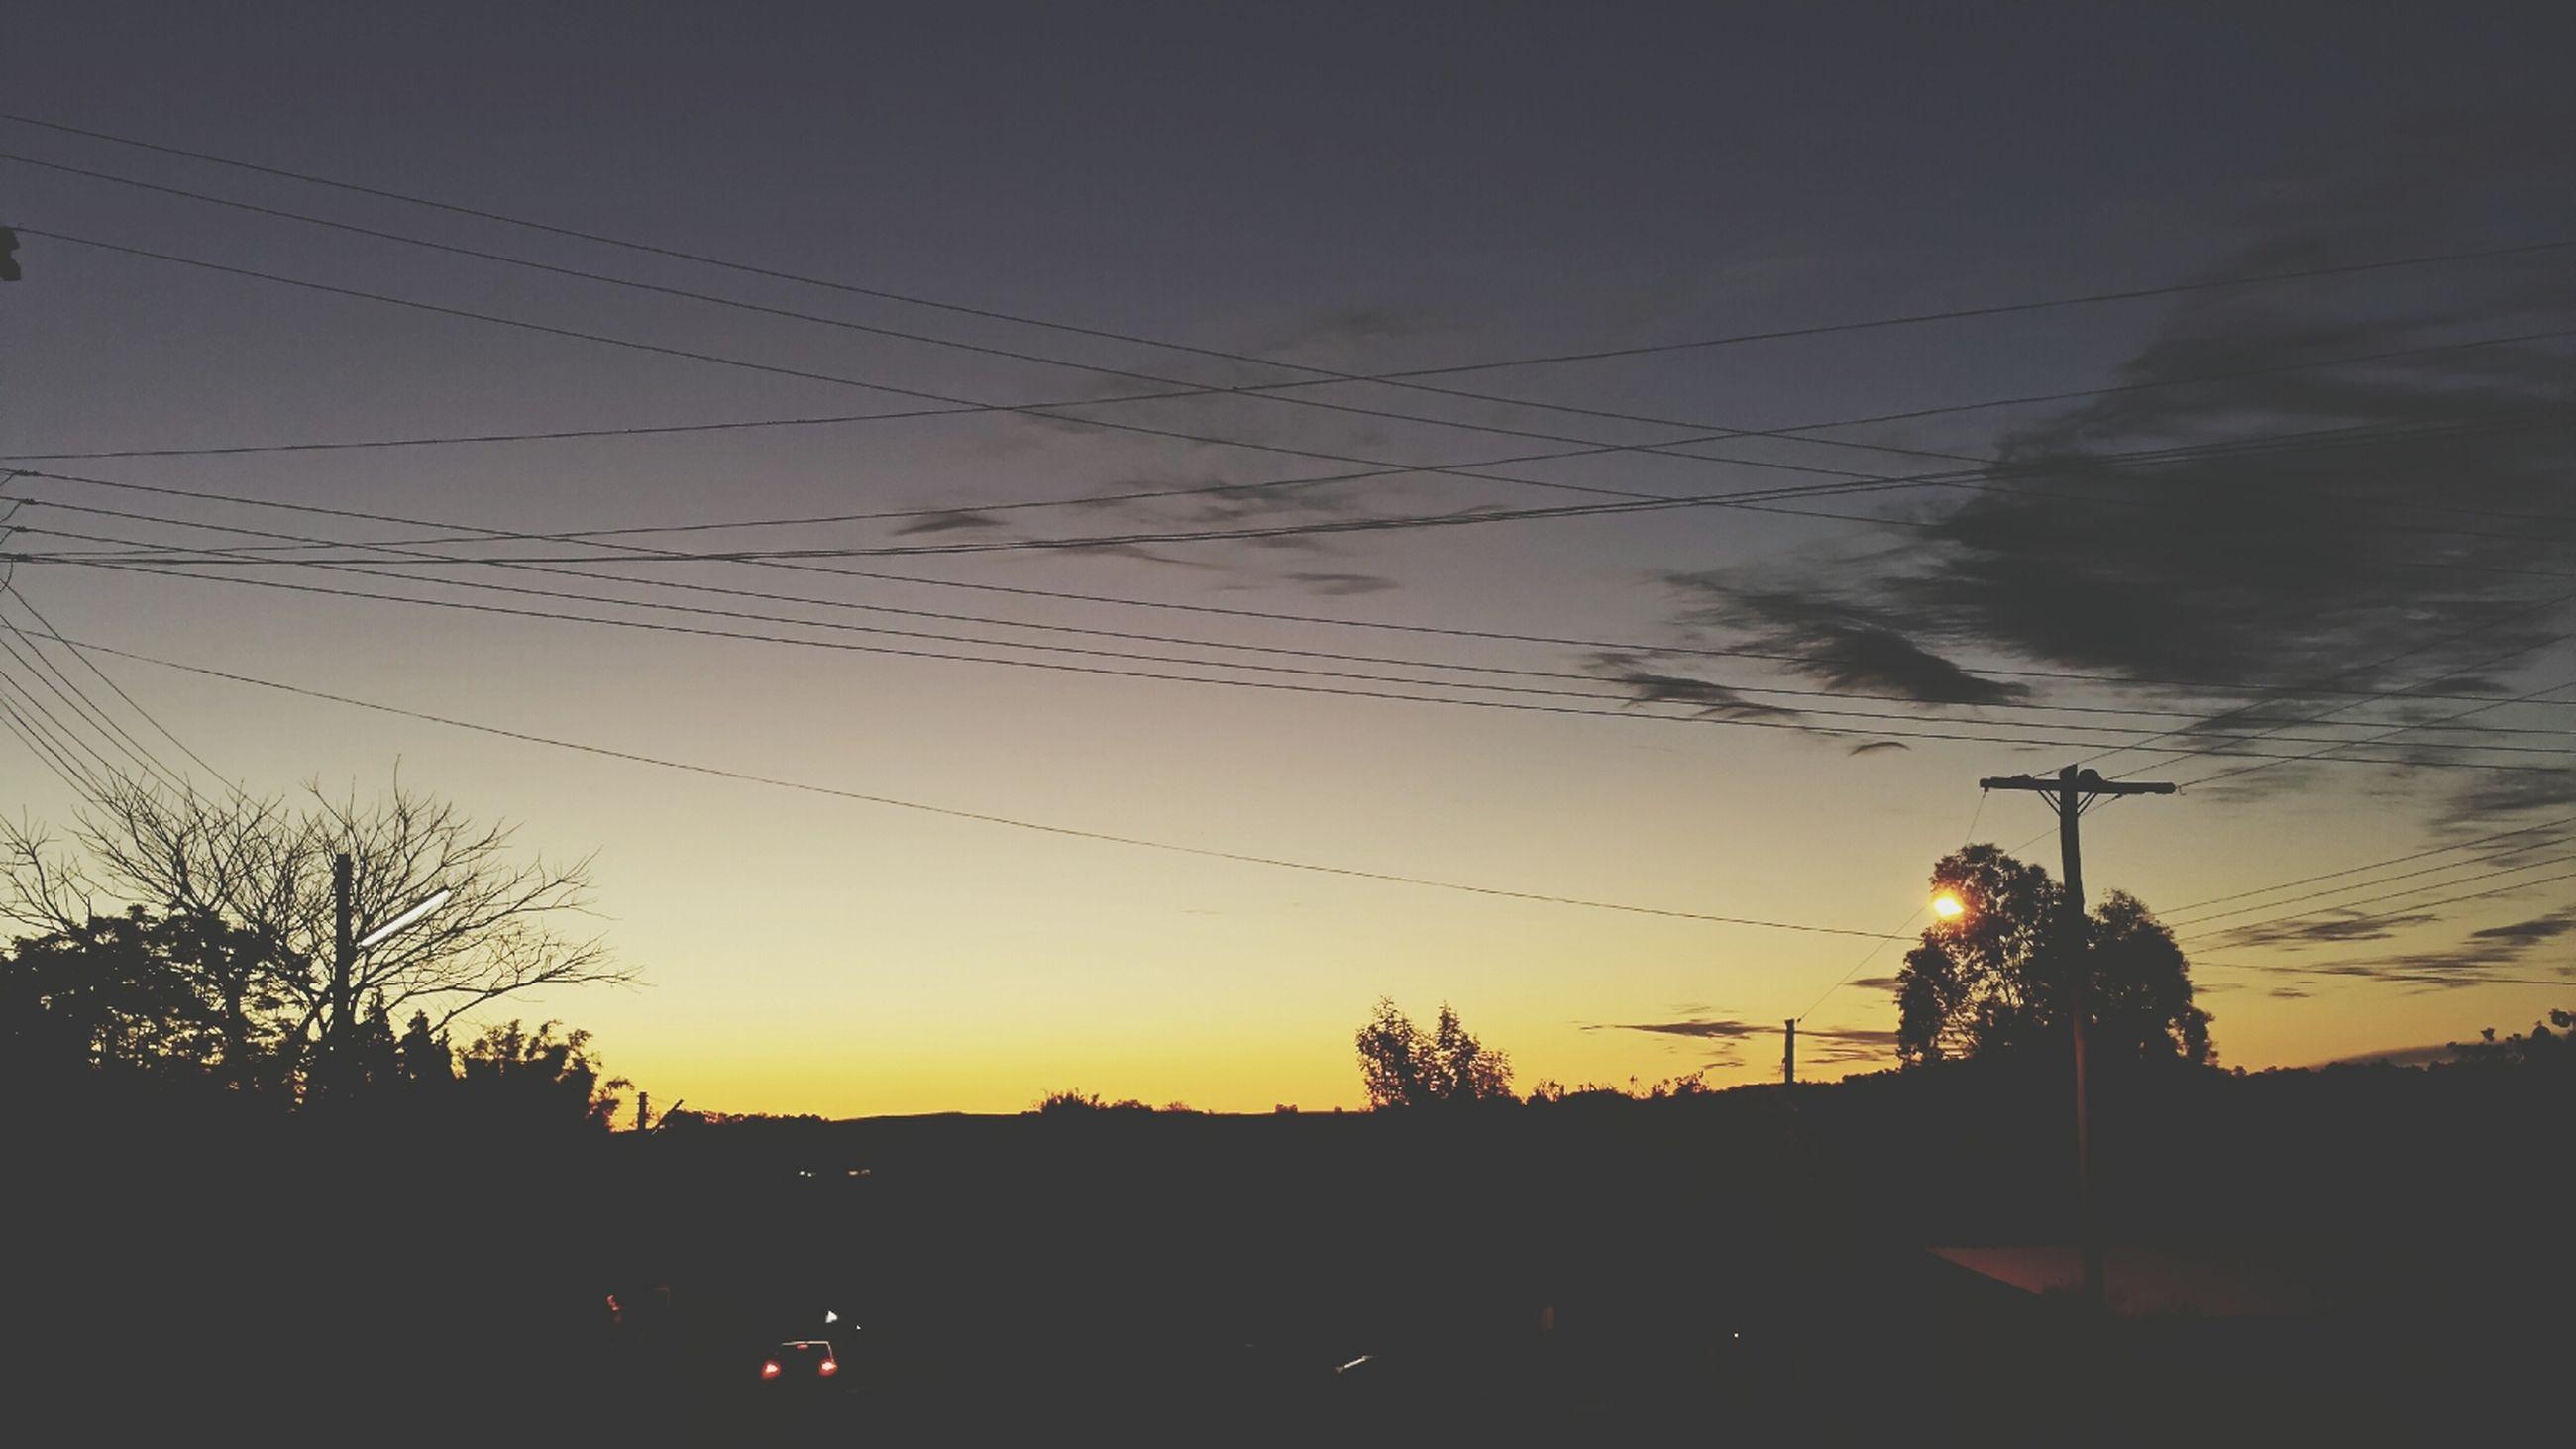 silhouette, sunset, sky, power line, tree, technology, nature, copy space, leisure activity, dusk, outdoors, lifestyles, electricity pylon, clear sky, transportation, beauty in nature, orange color, landscape